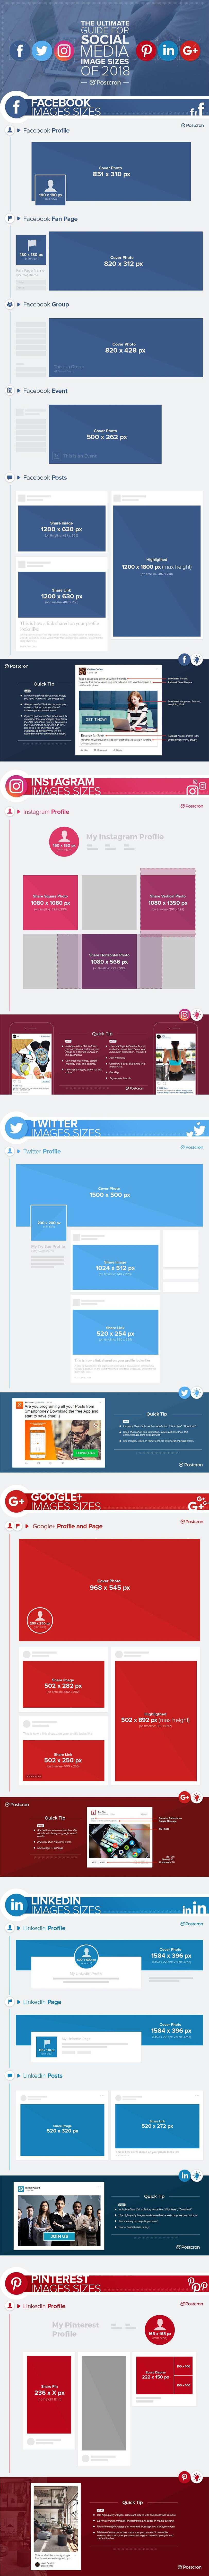 Social Media Image Sizes 2018 - Sync Digital Solutions